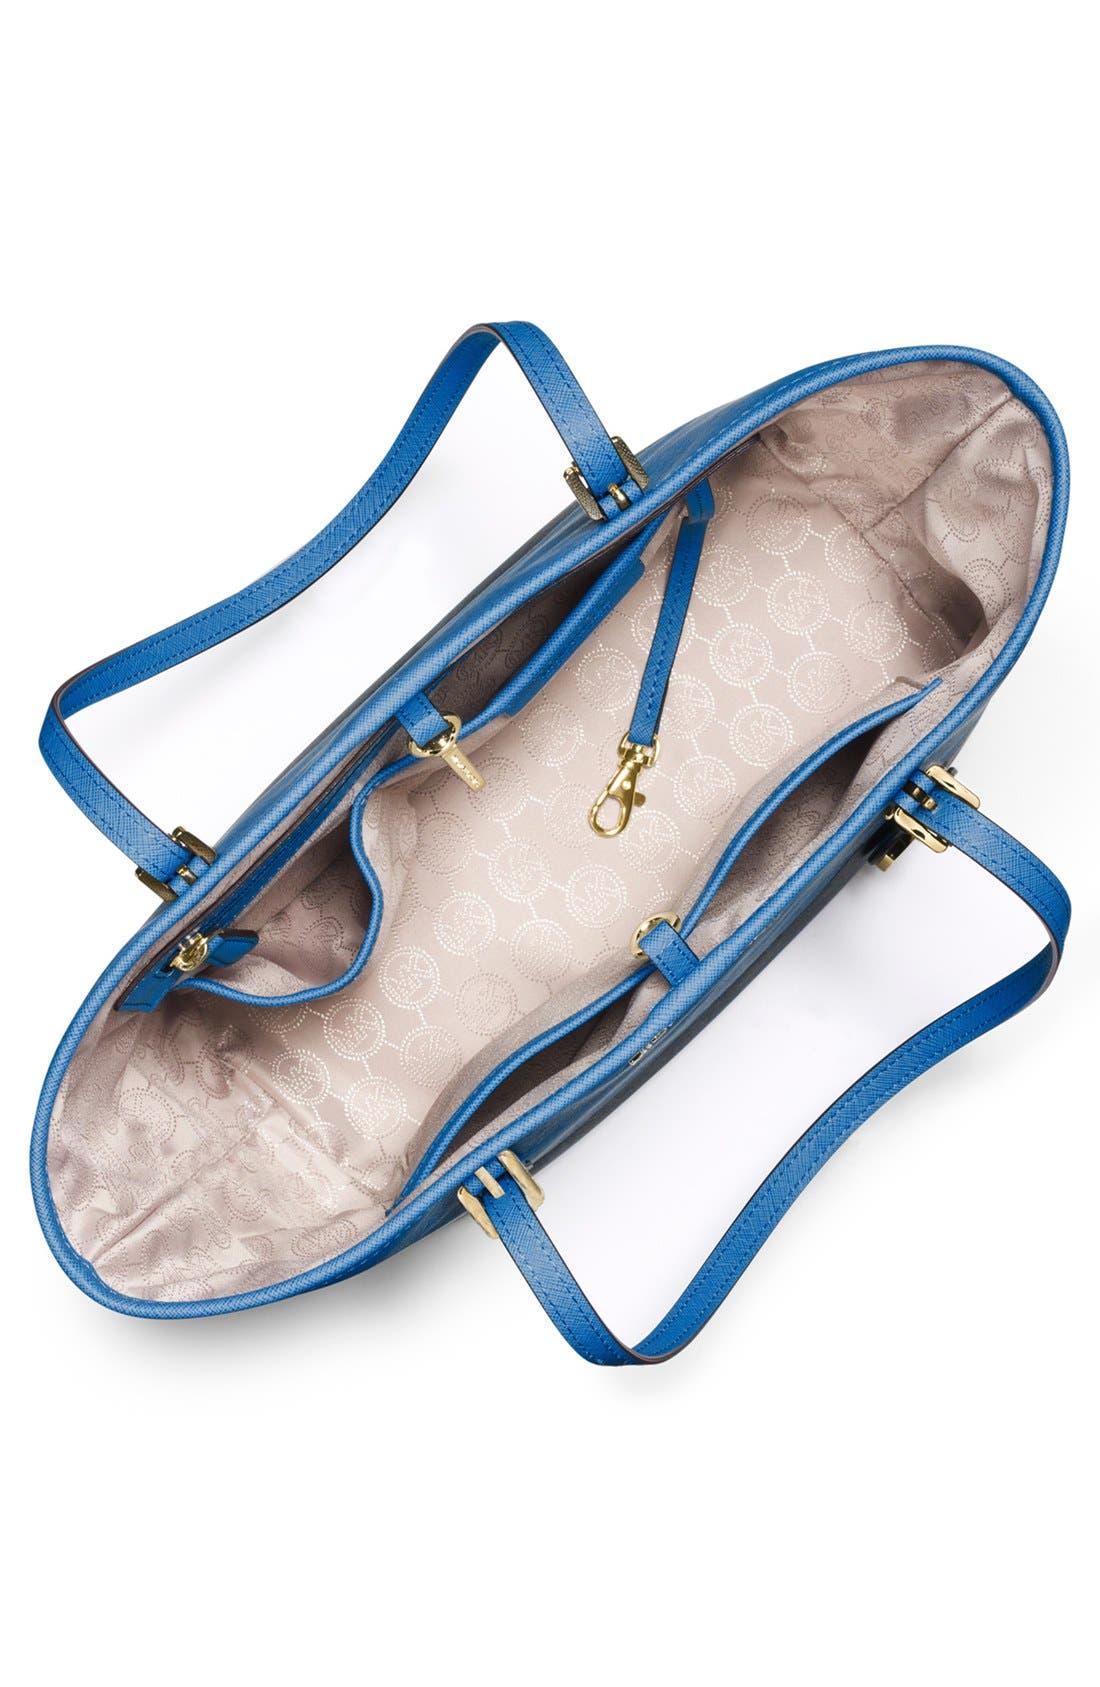 Alternate Image 3  - MICHAEL Michael Kors 'Small Jet Set' Saffiano Leather Travel Tote